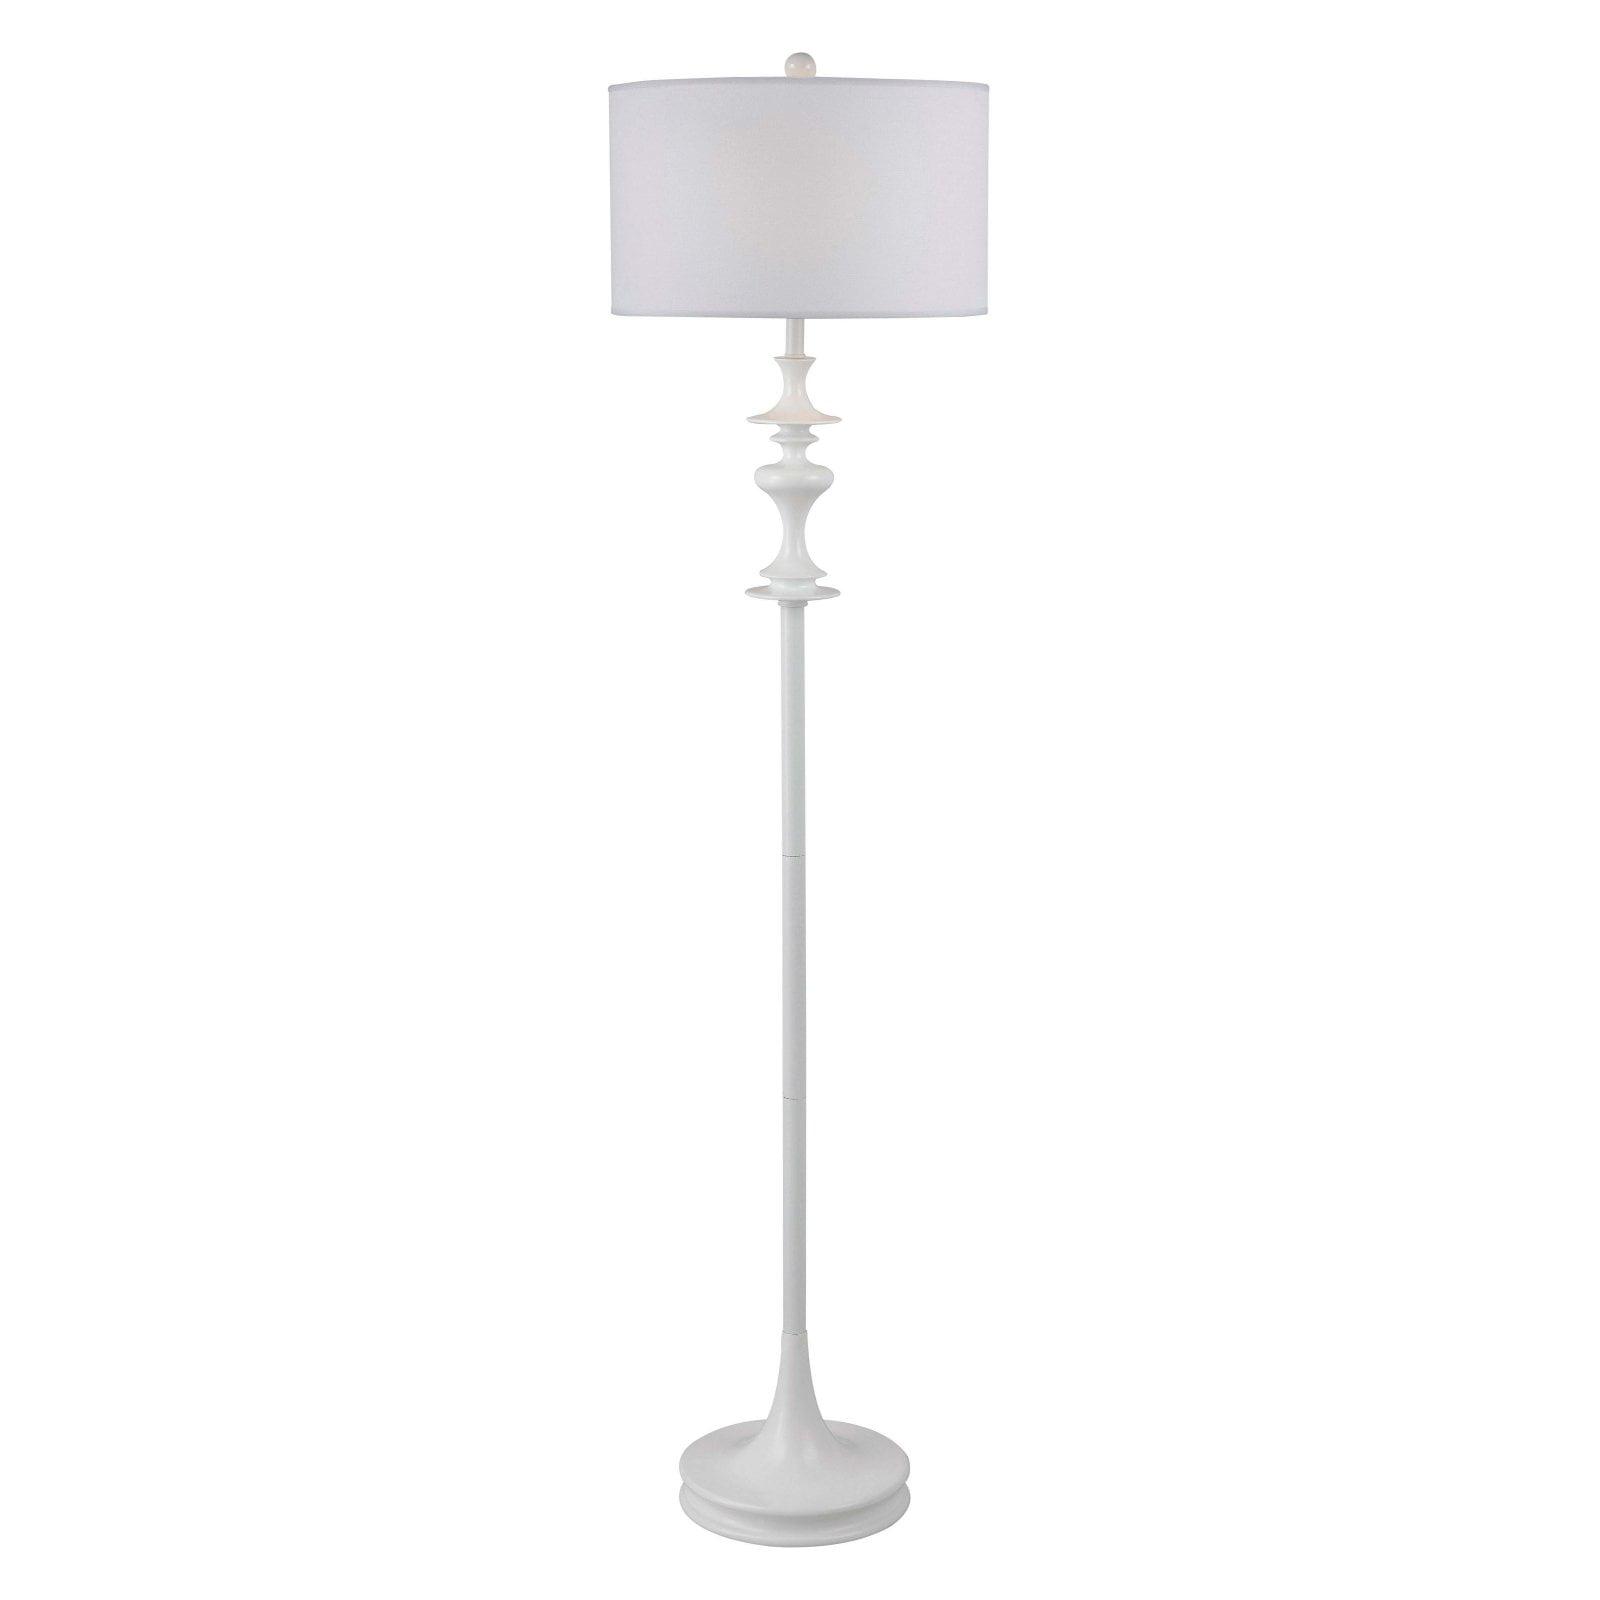 Kenroy Home Claiborne Floor Lamp, White Gloss by Kenroy Home